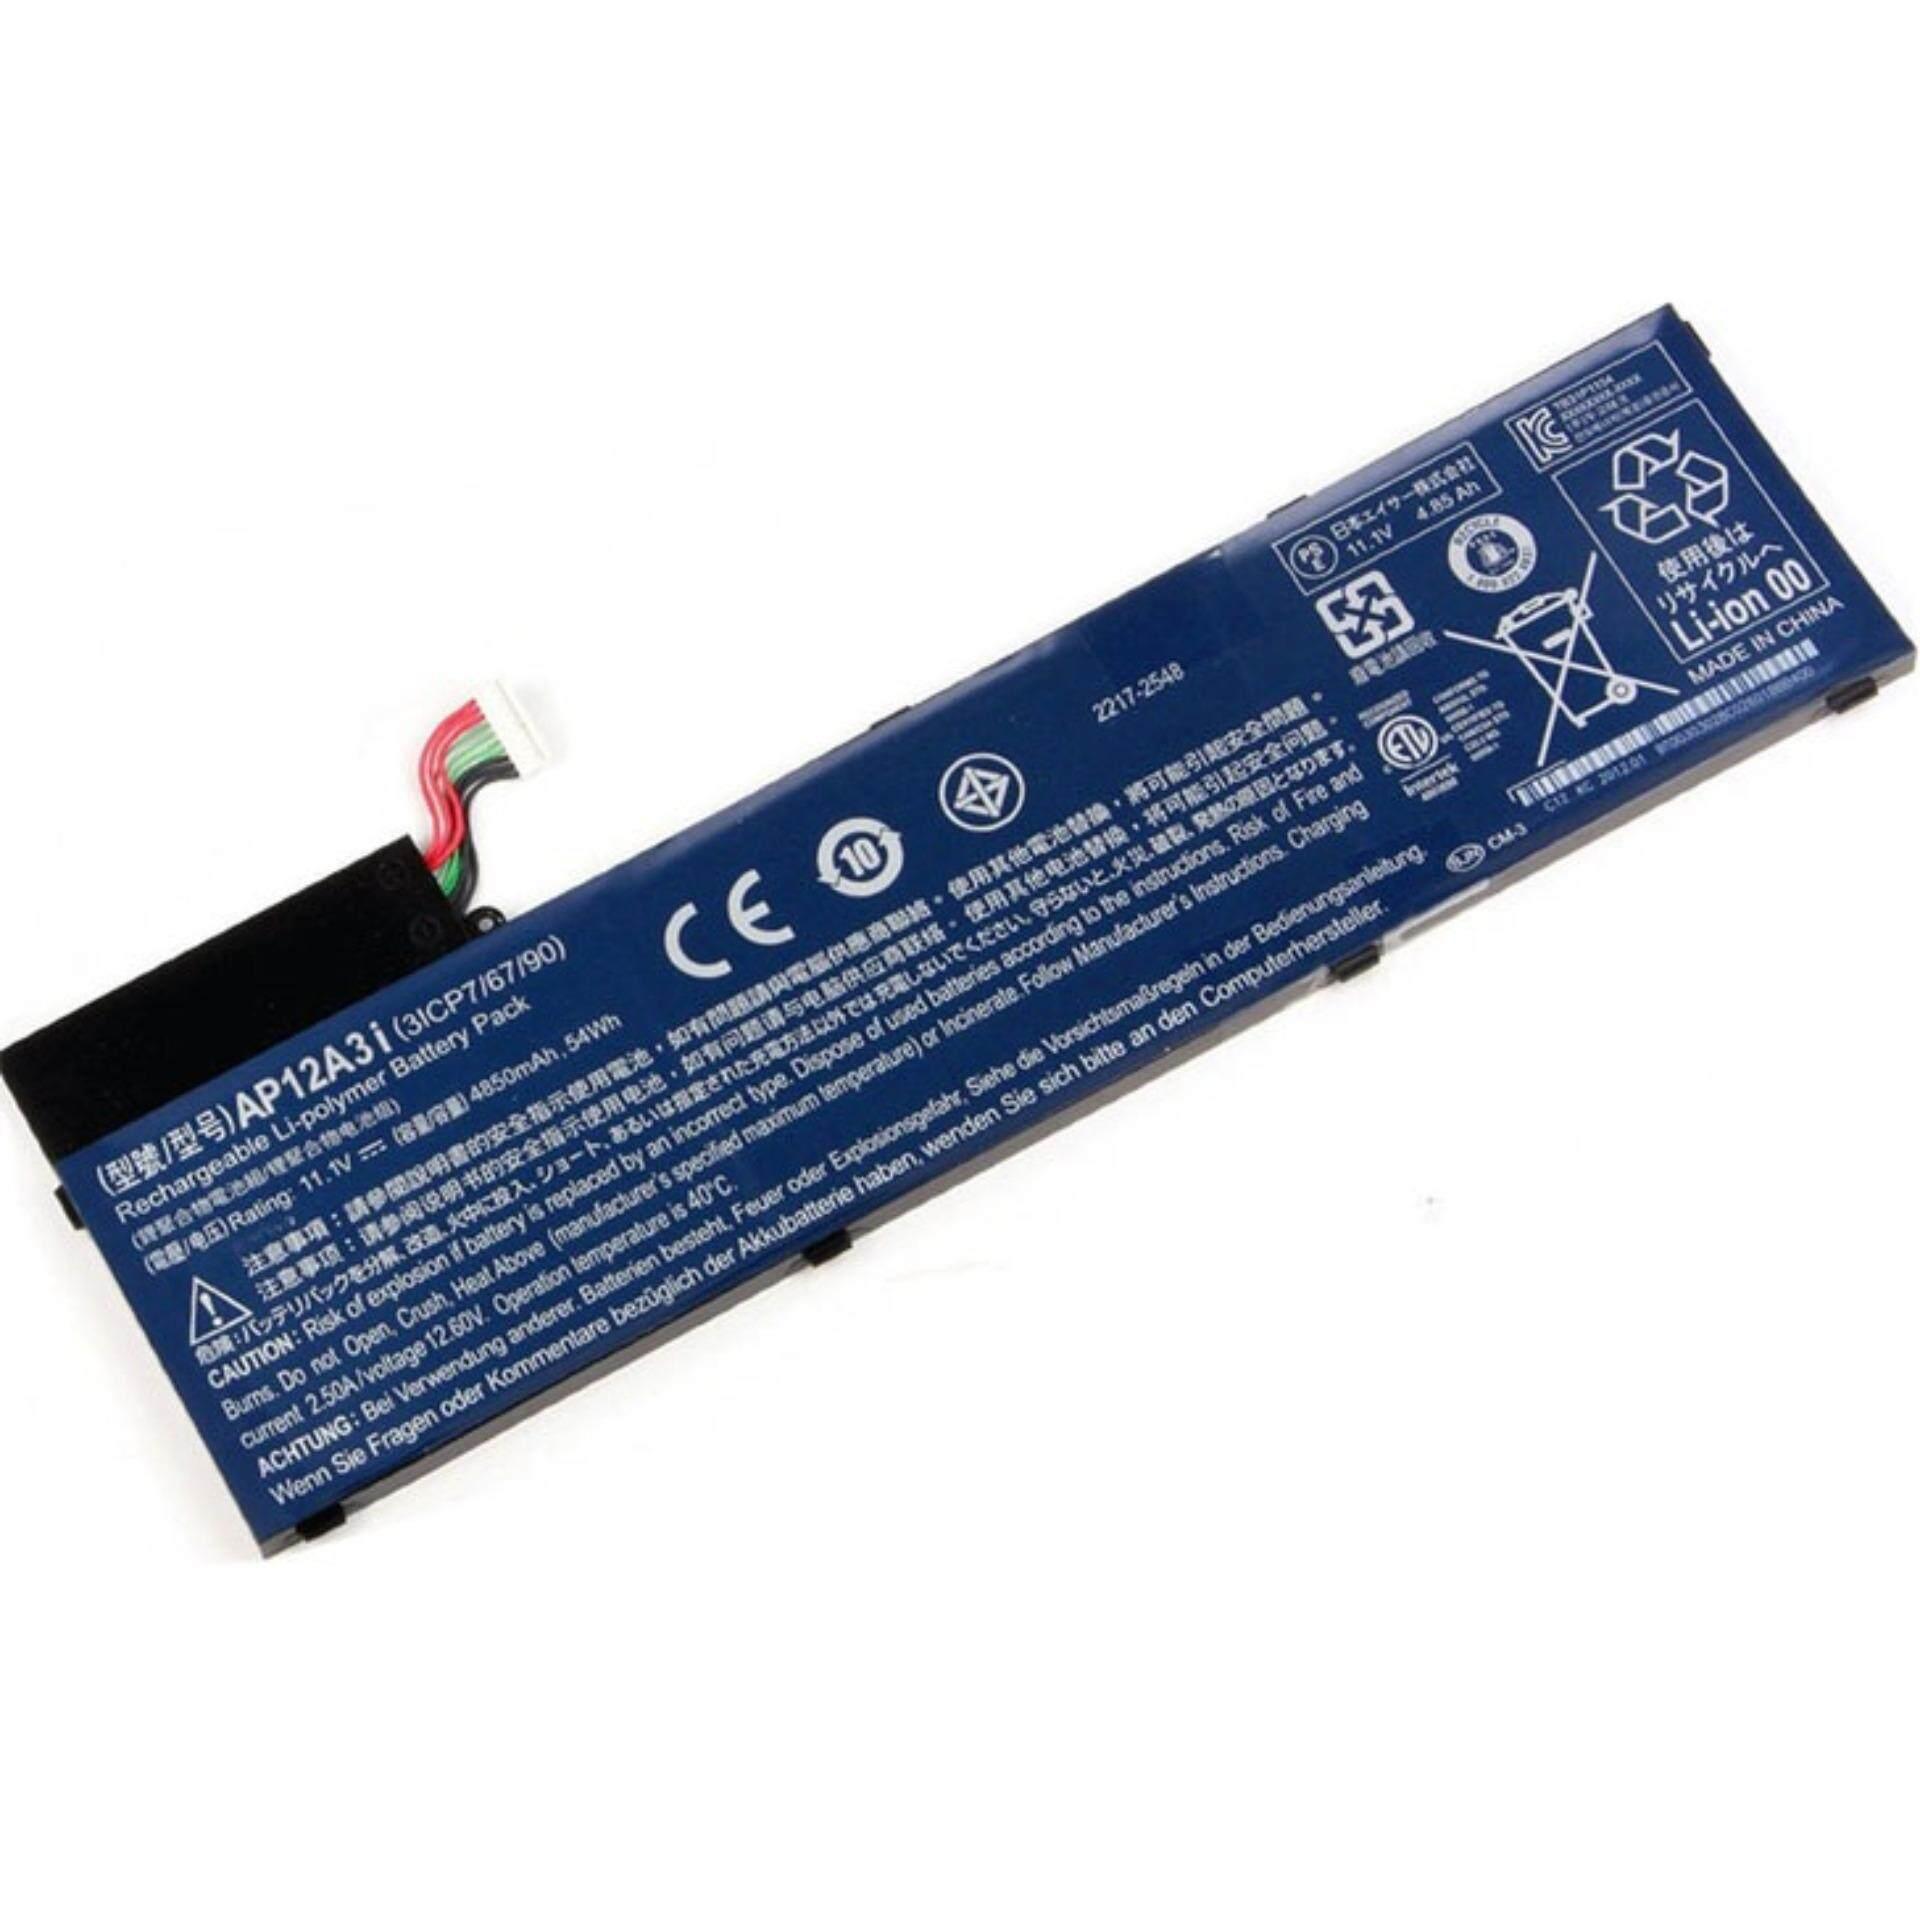 Acer Aspire M5-481TG Laptop Battery